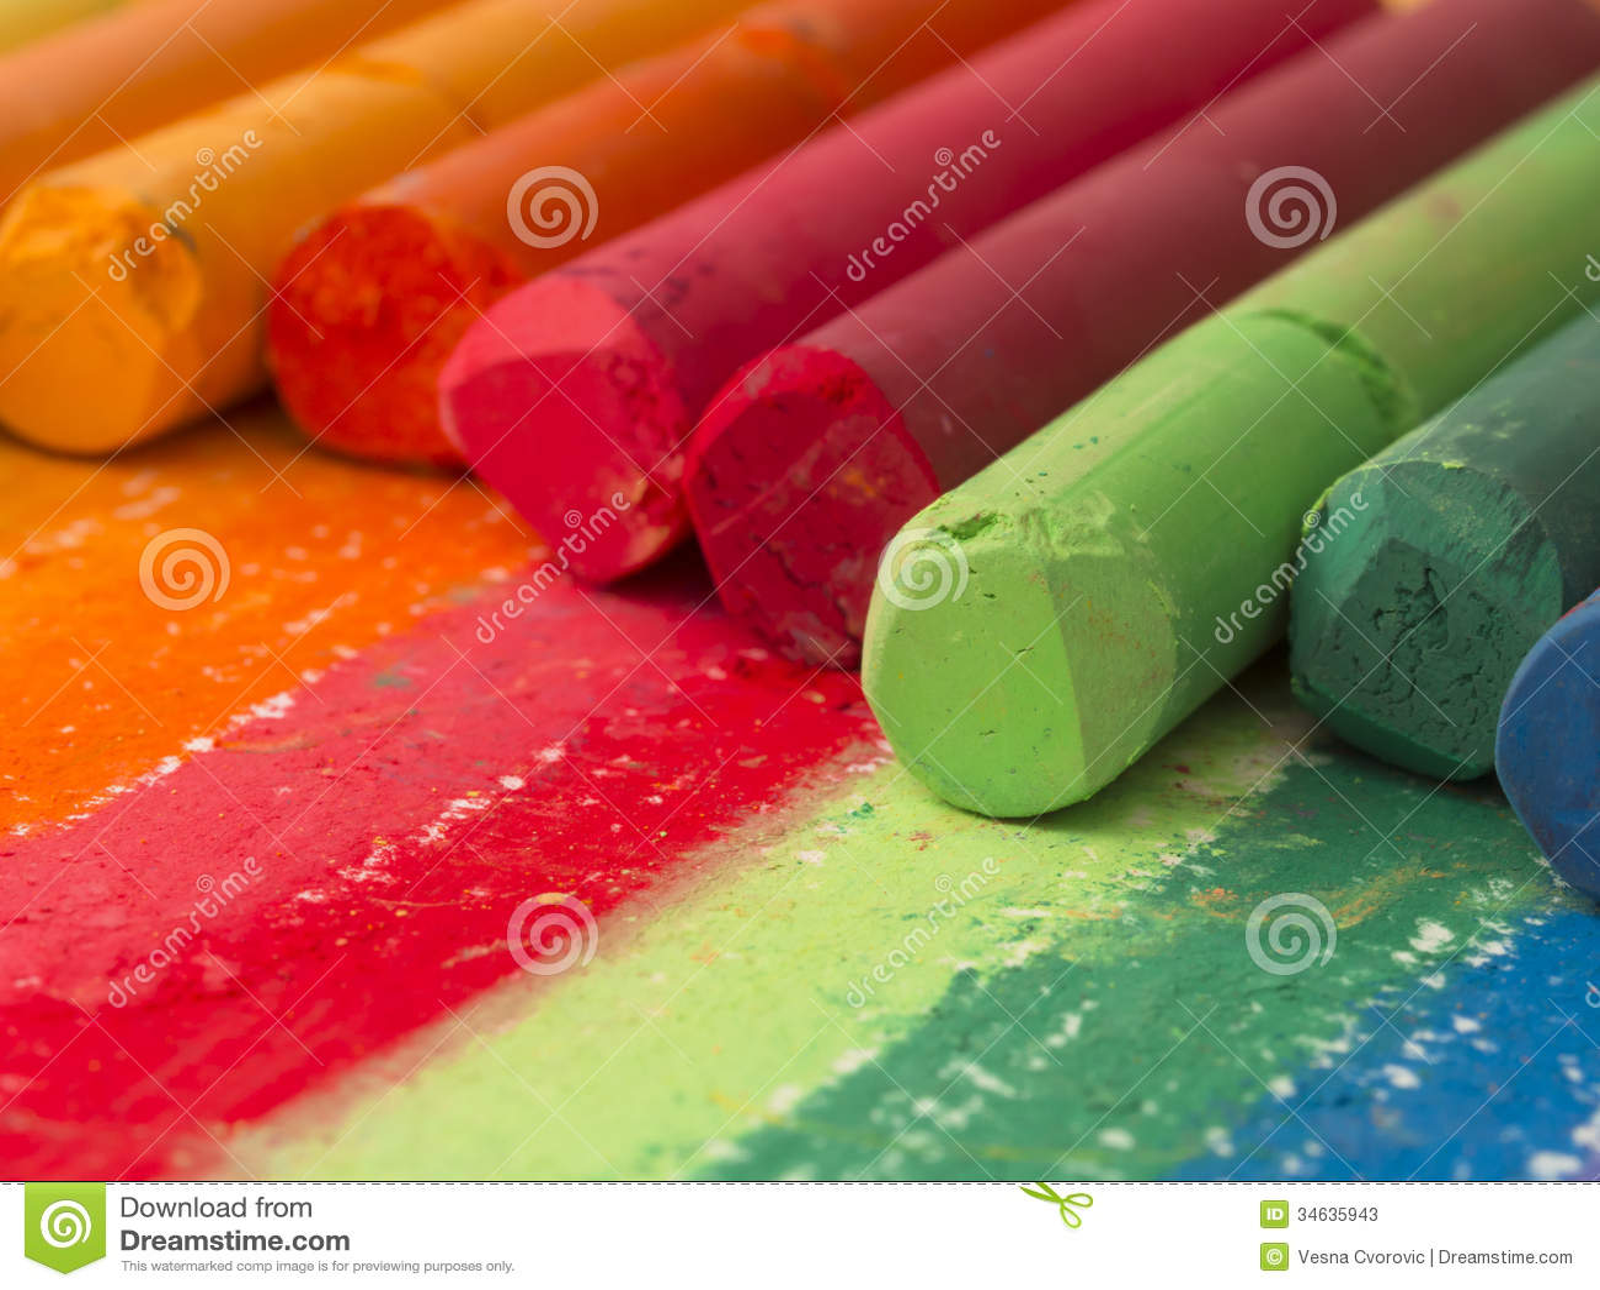 spectrum of artistic crayons stock photos image 34635943